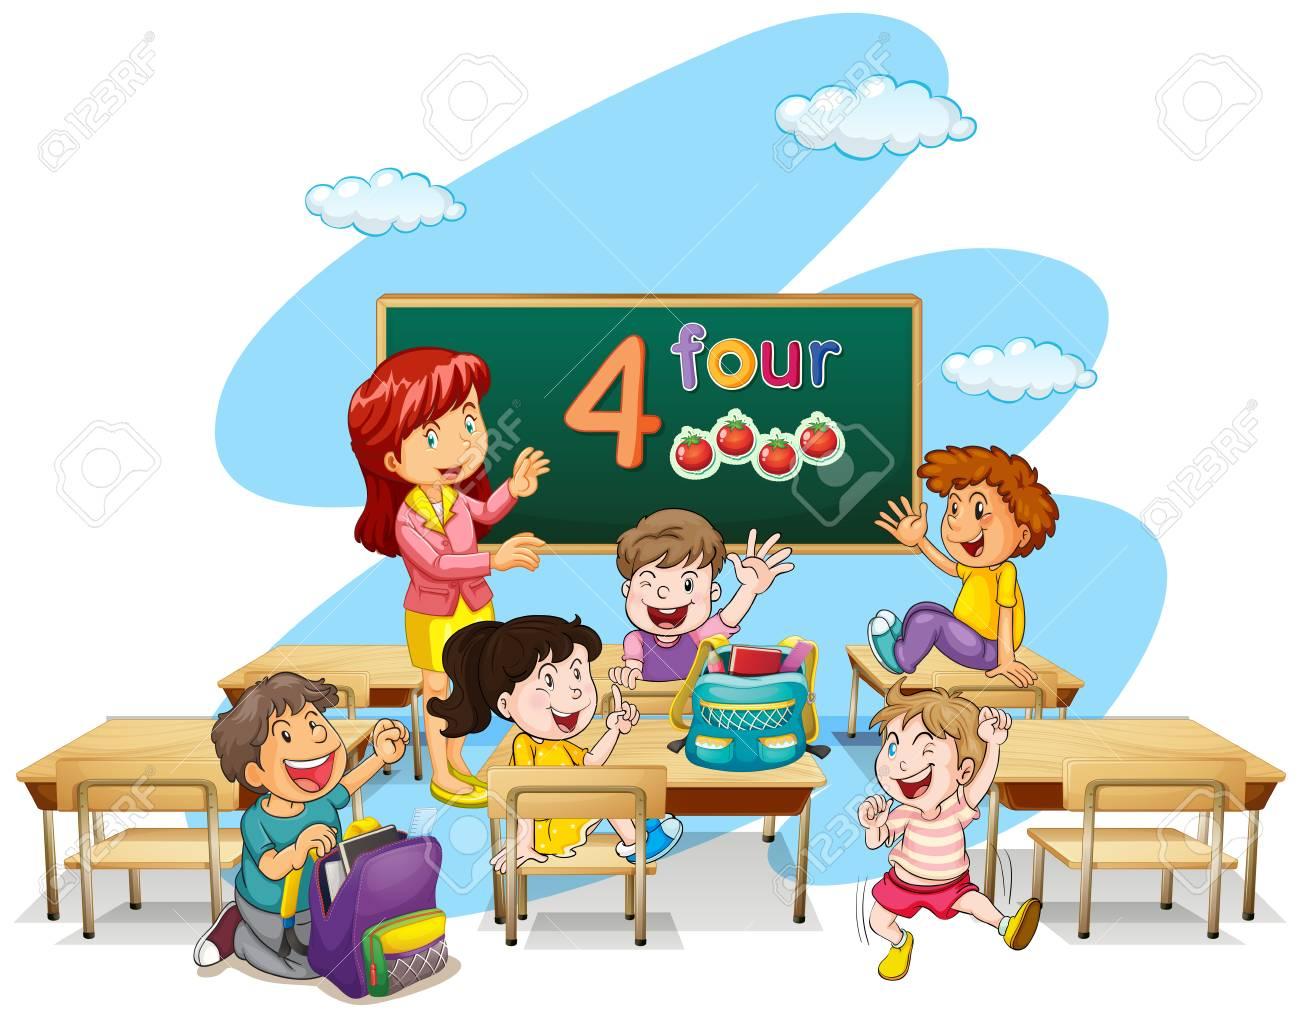 hight resolution of teacher teaching students in classroom illustration stock vector 64619713